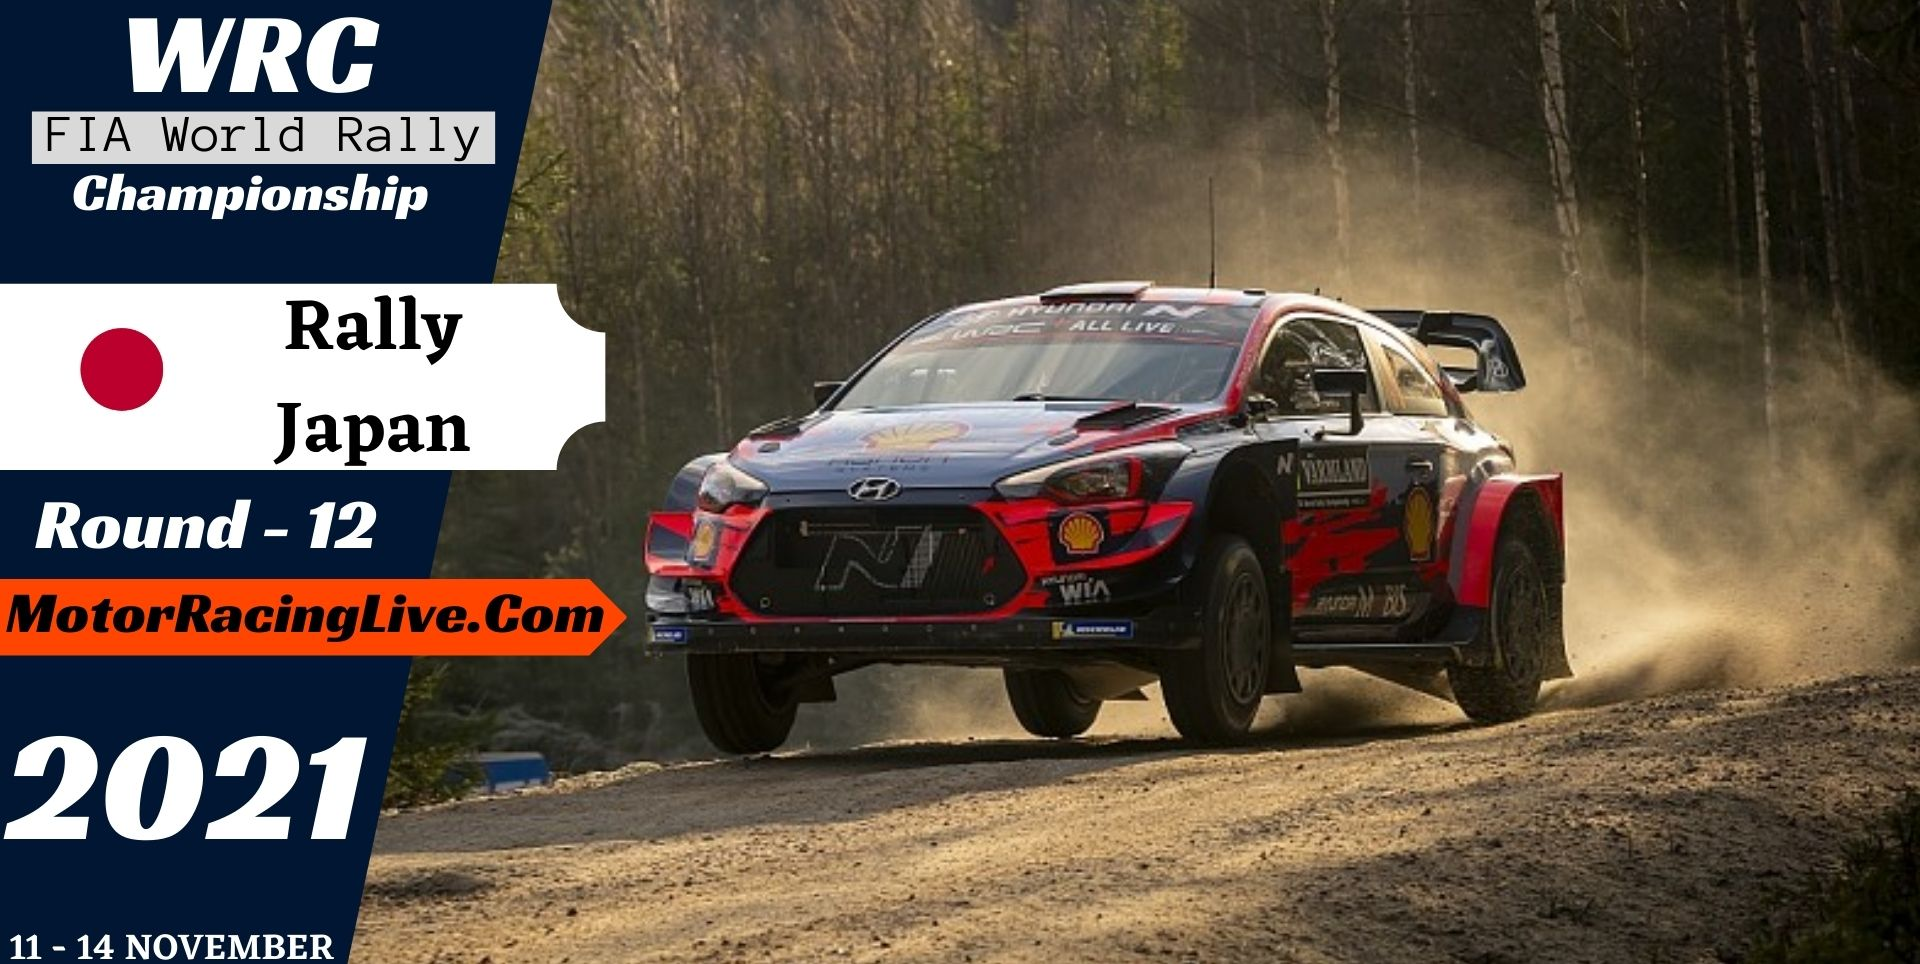 WRC Rally Japan Round 12 Live Stream 2021